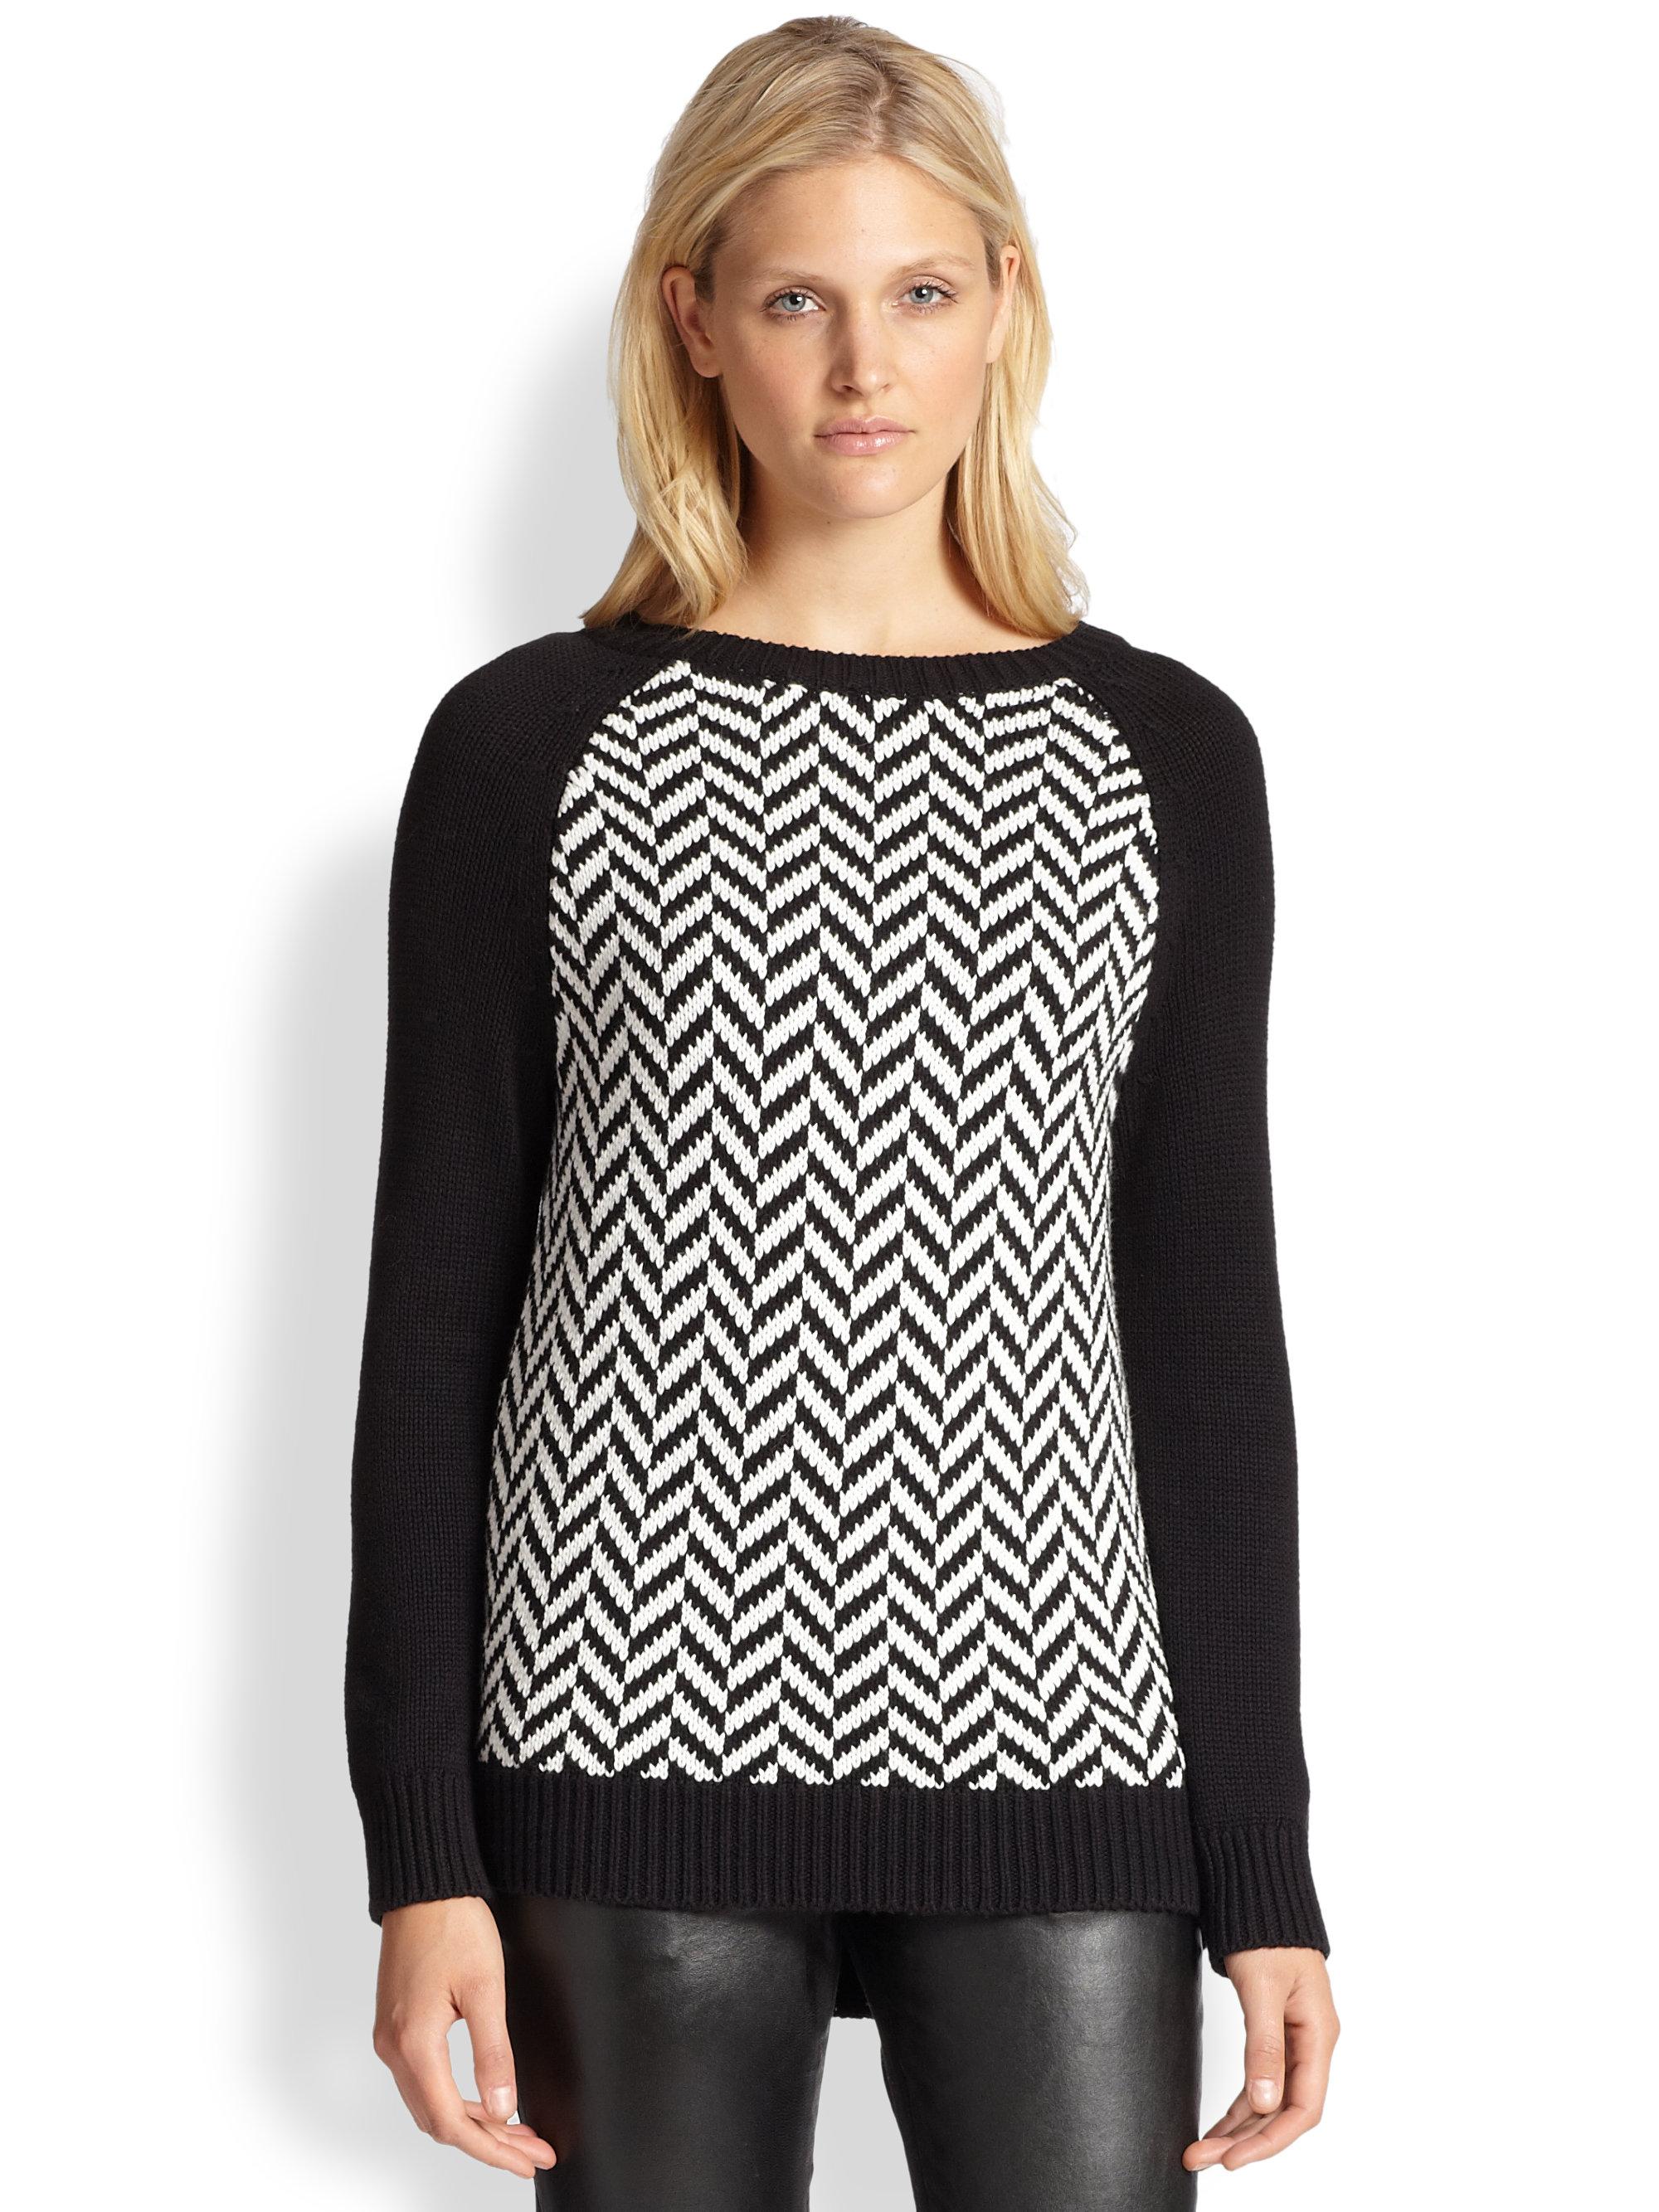 Michael michael kors Herringbone Sweater in Black | Lyst